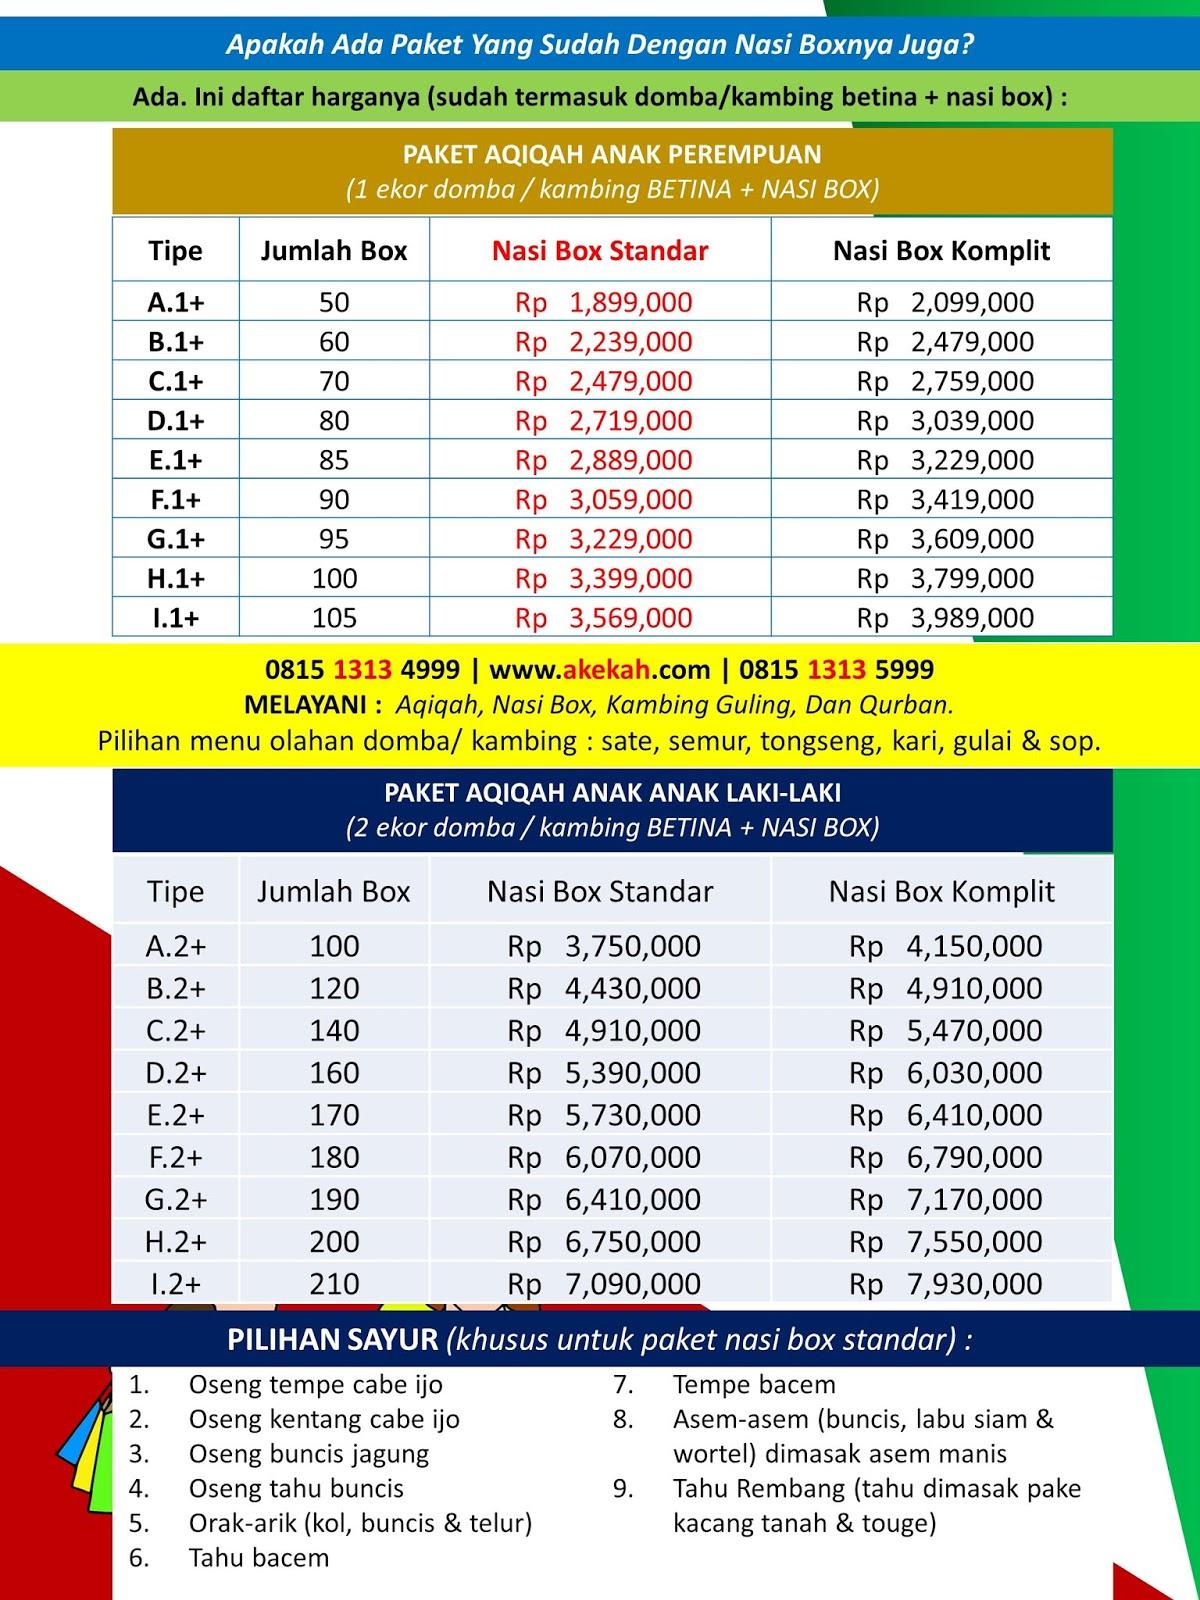 Harga Akikah Dan Catering Untuk Anak Laki-Laki Kecamatan Rumpin Kabupaten Bogor Jawa Barat